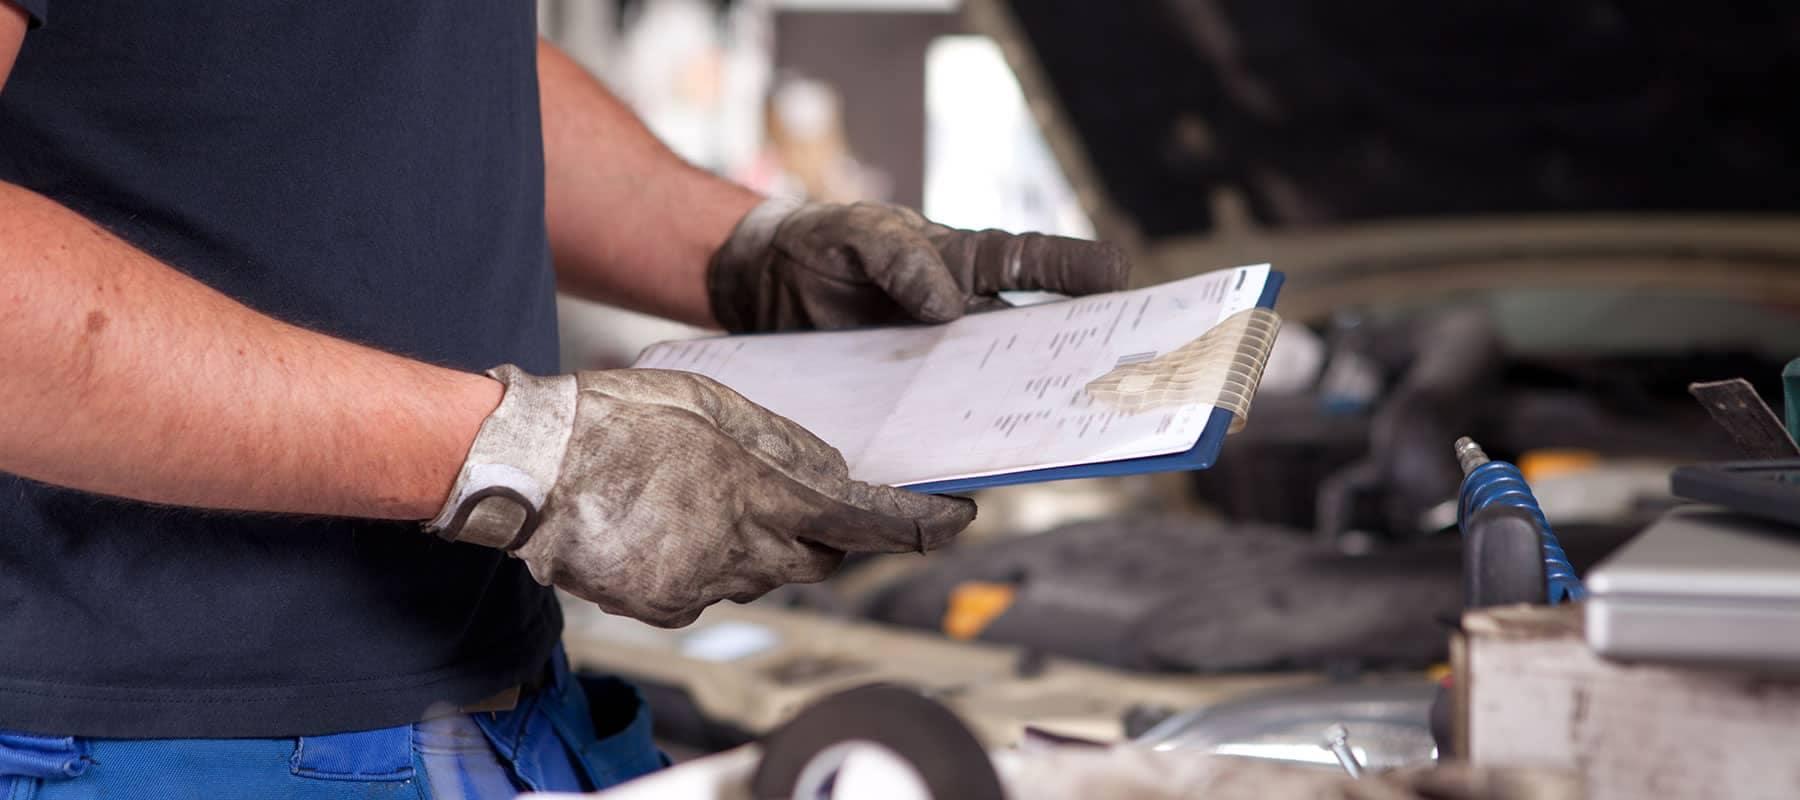 Service Center - Vehicle Inspection Checklist